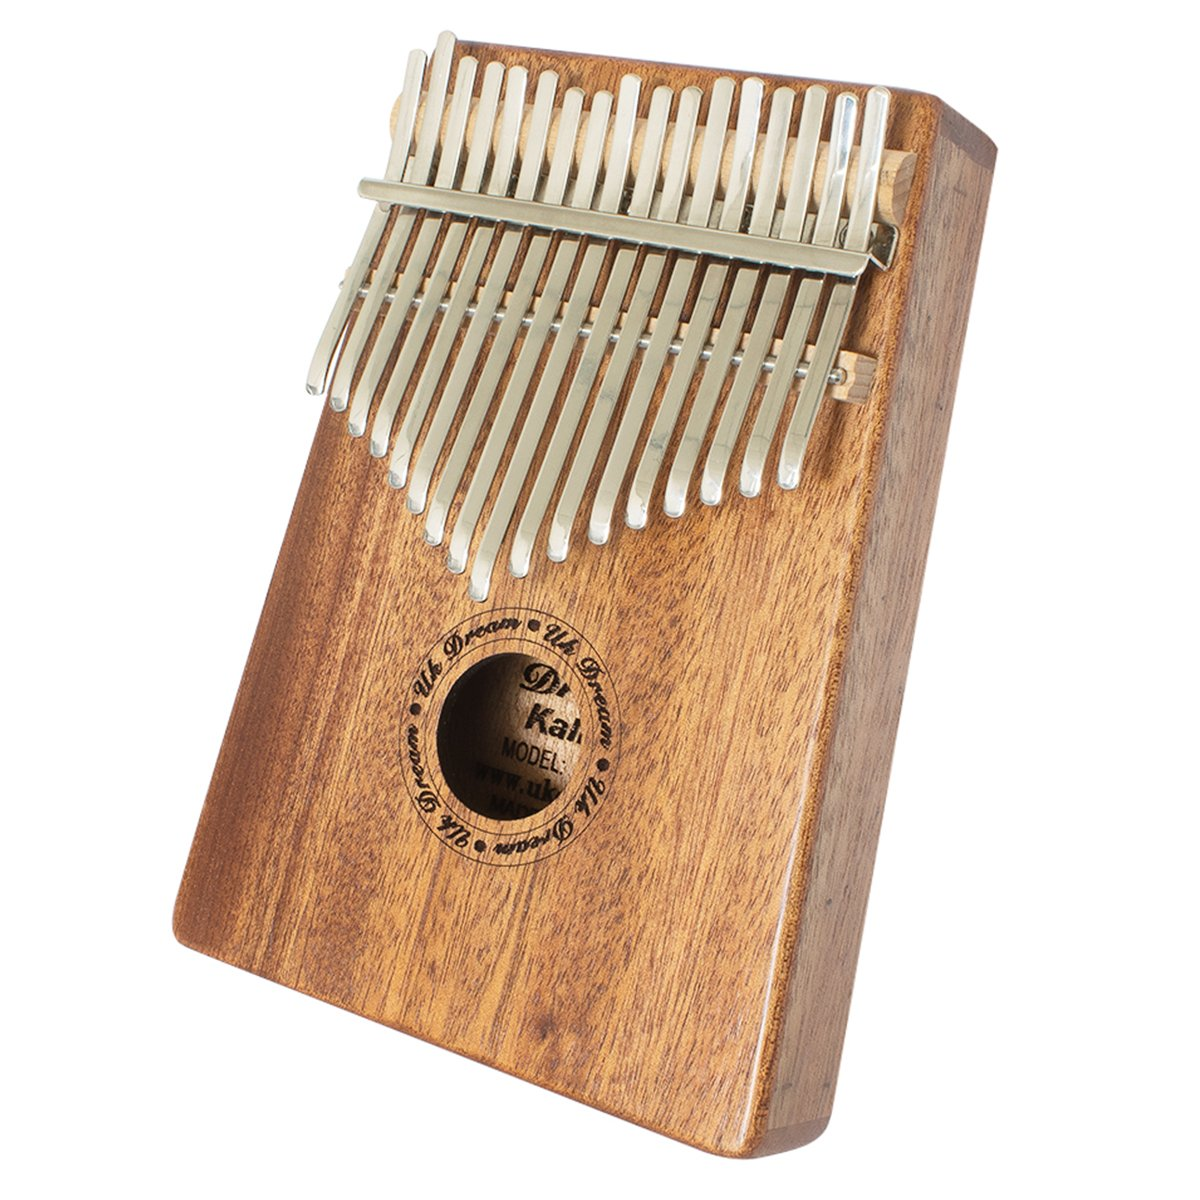 Thumb Piano 17 Keys Kalimba Mahogany Body Portable Instrument with Tuning Hammer Music Book Carry Bag etc 4336351432